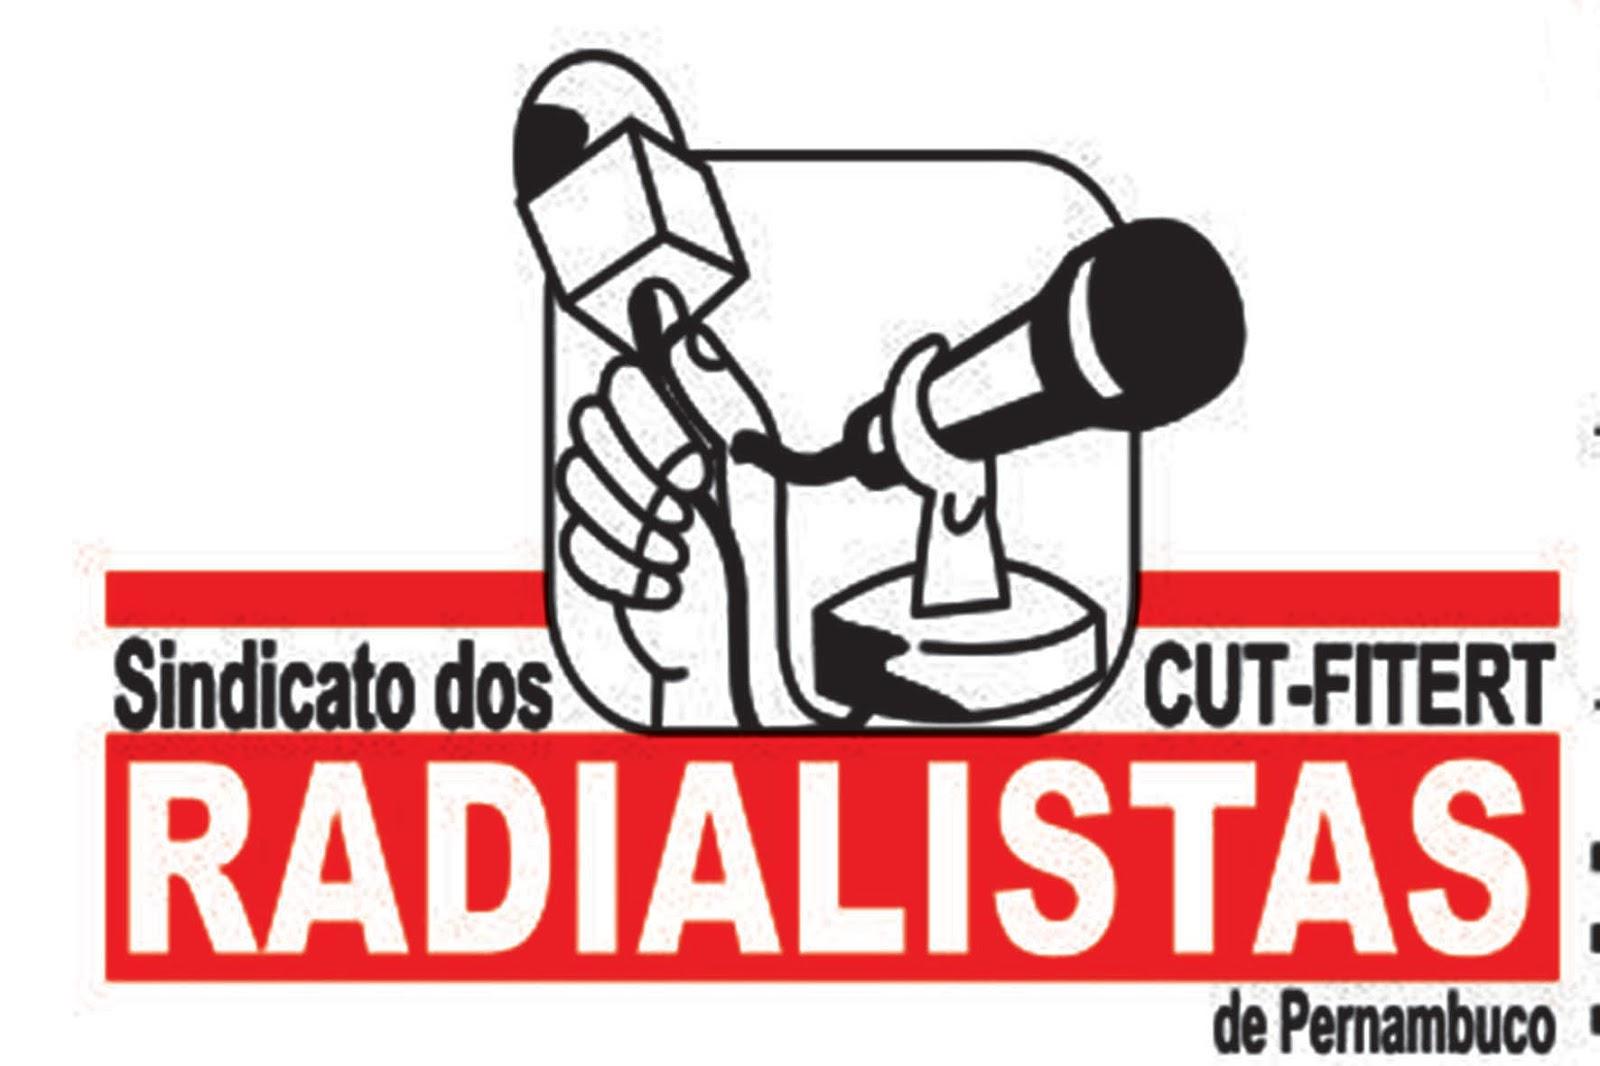 SINDICATO DOS RADIALISTAS DO ESTADO DE PERNAMBUCO